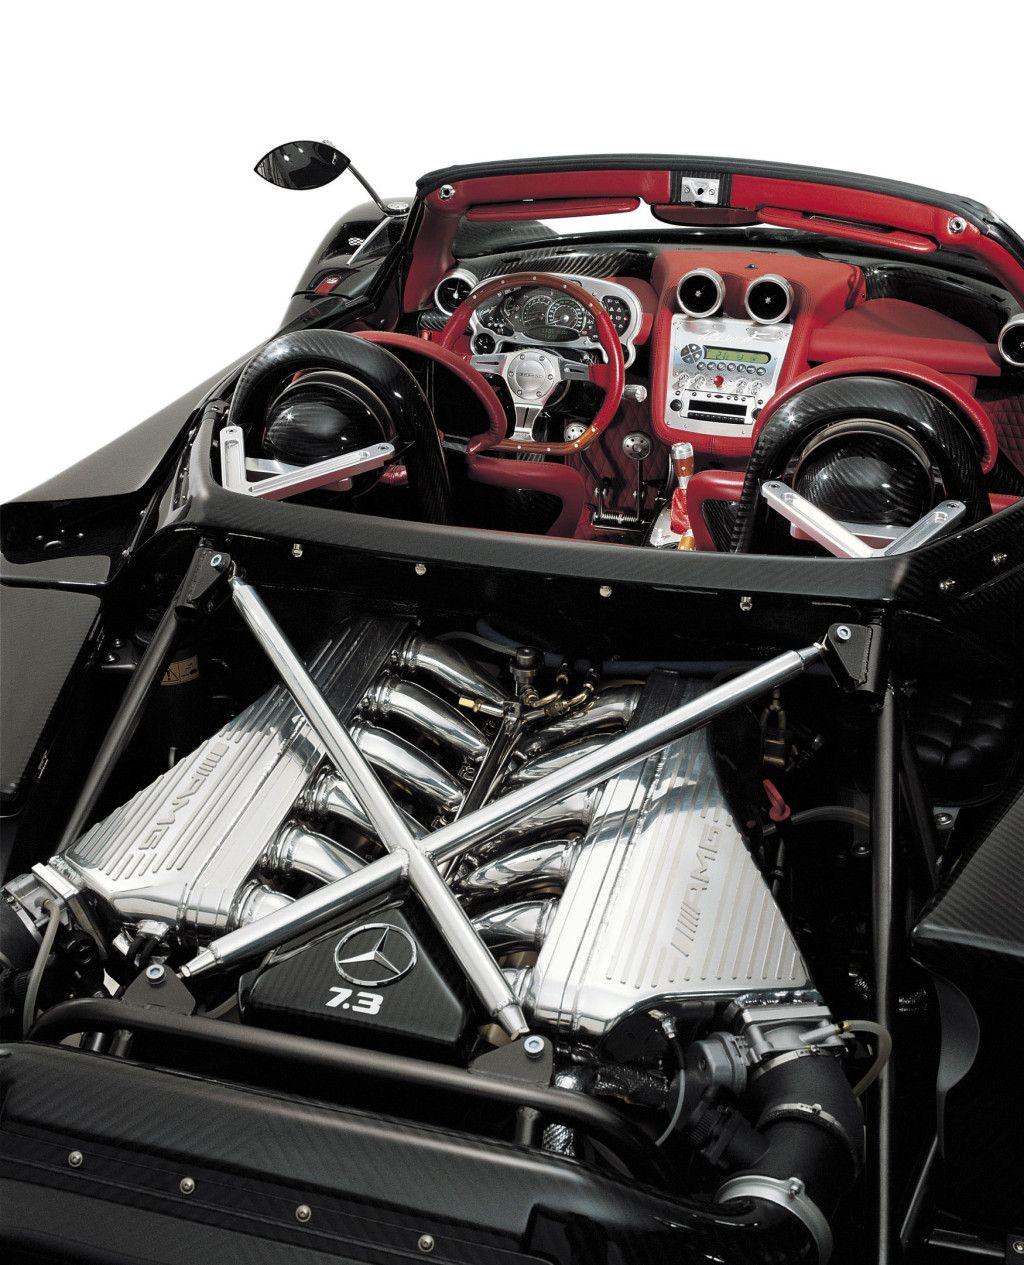 Pagani Zonda Roadster F 7.3 Liter V12 Mercedes AMG Engine